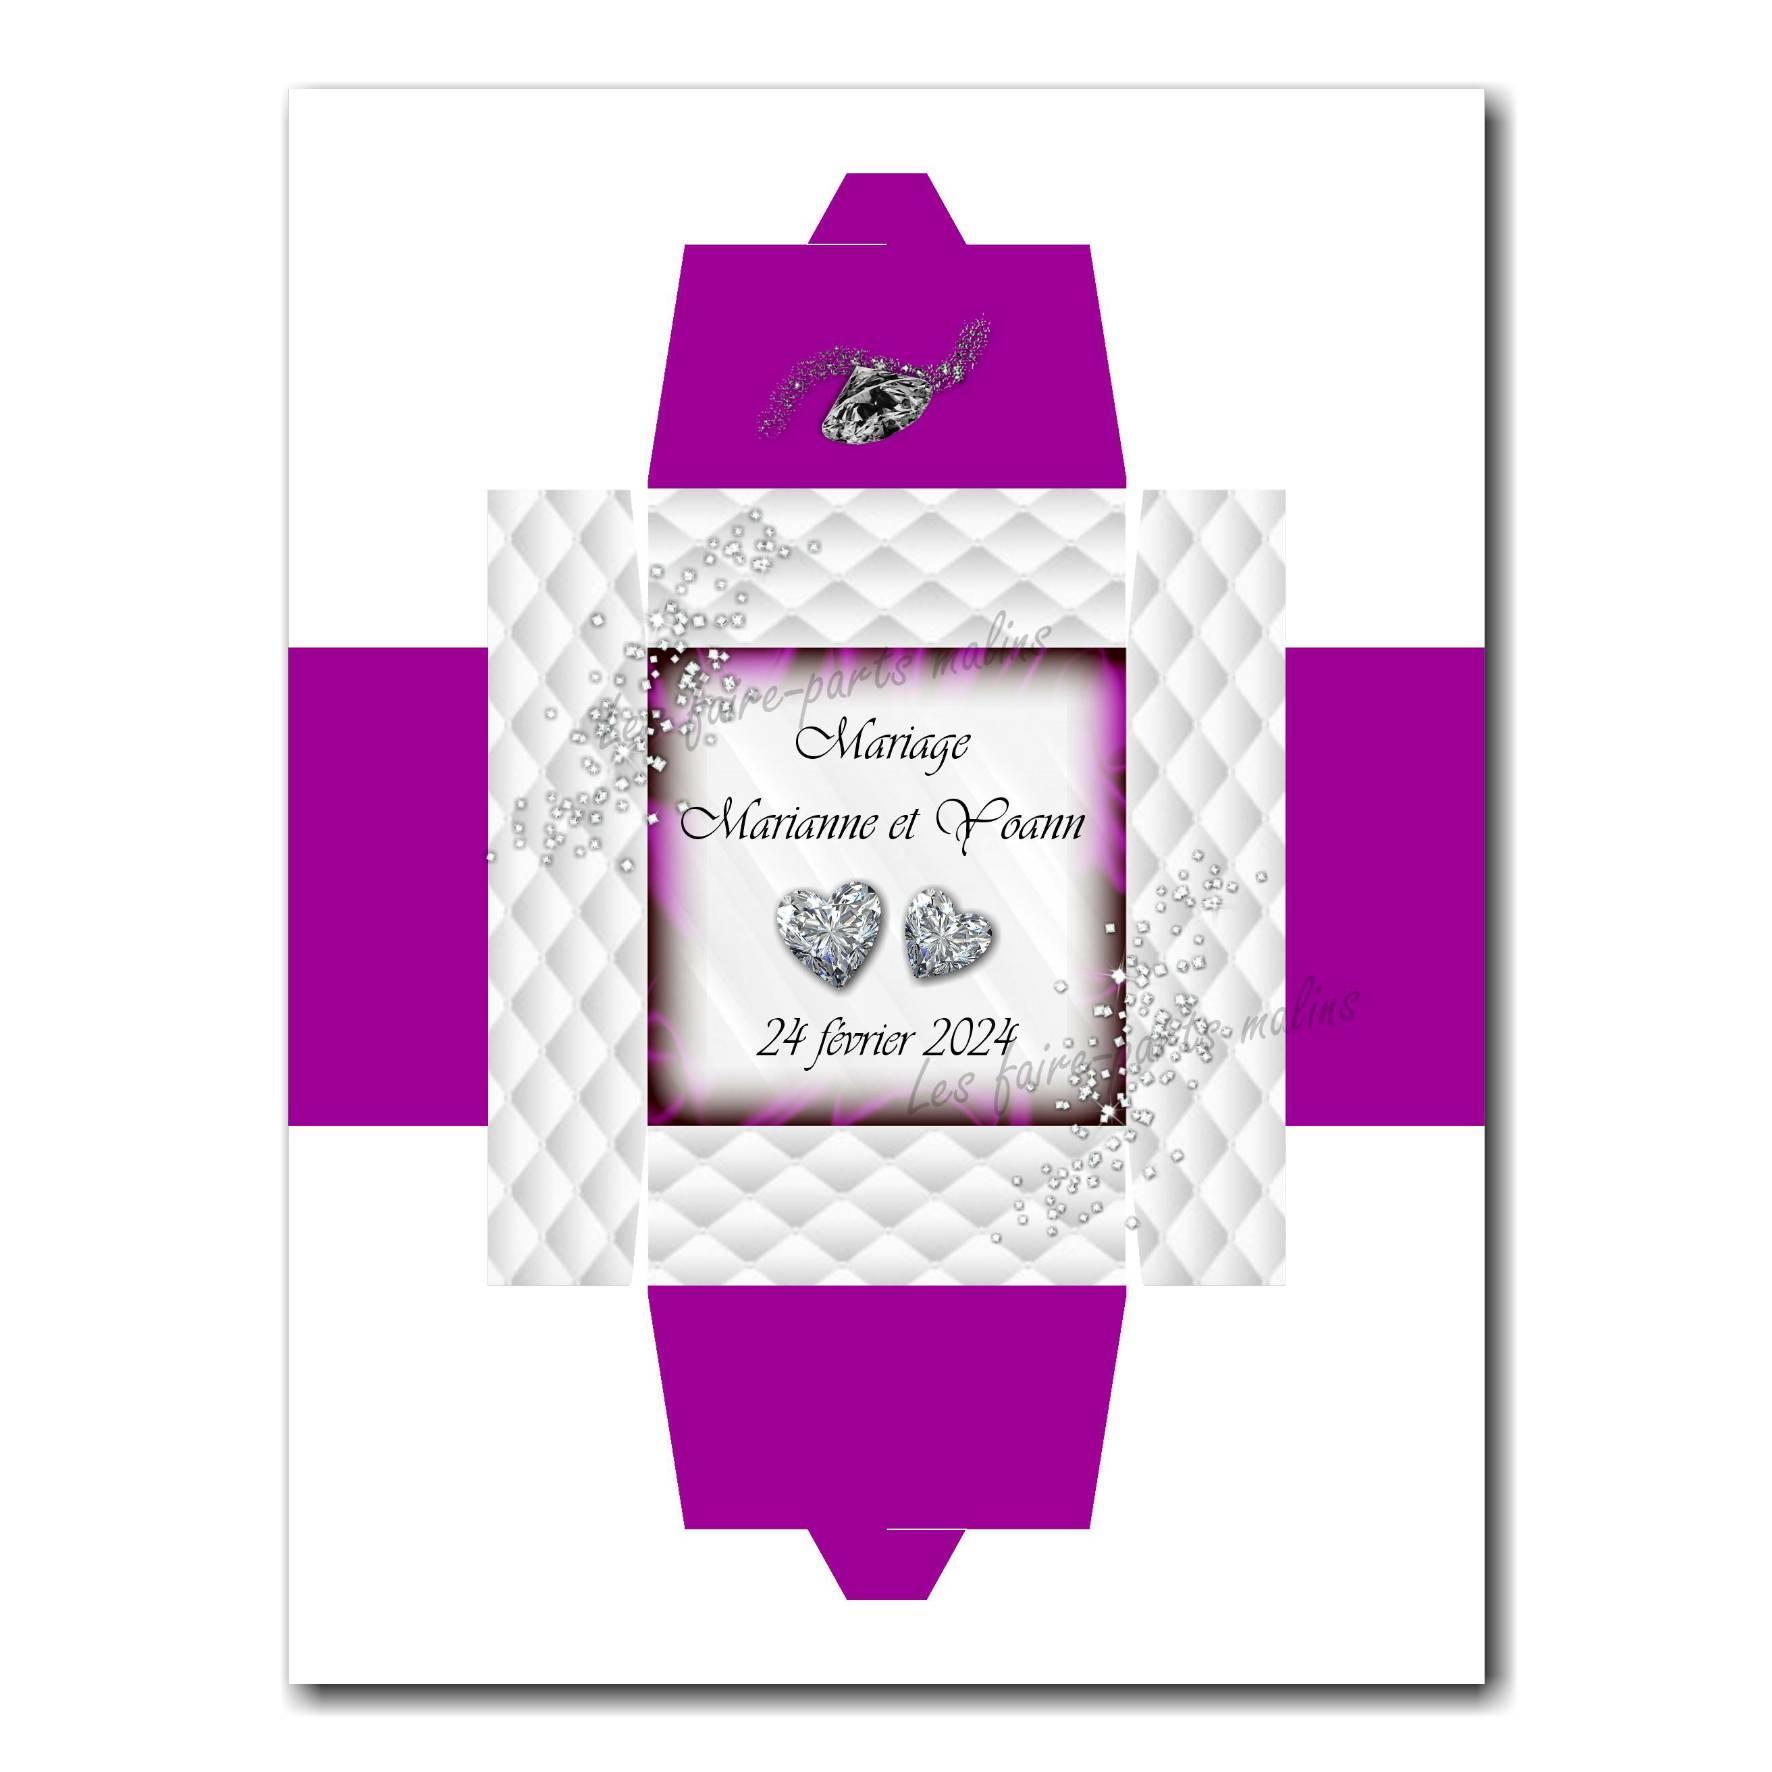 40 mariage boite violet